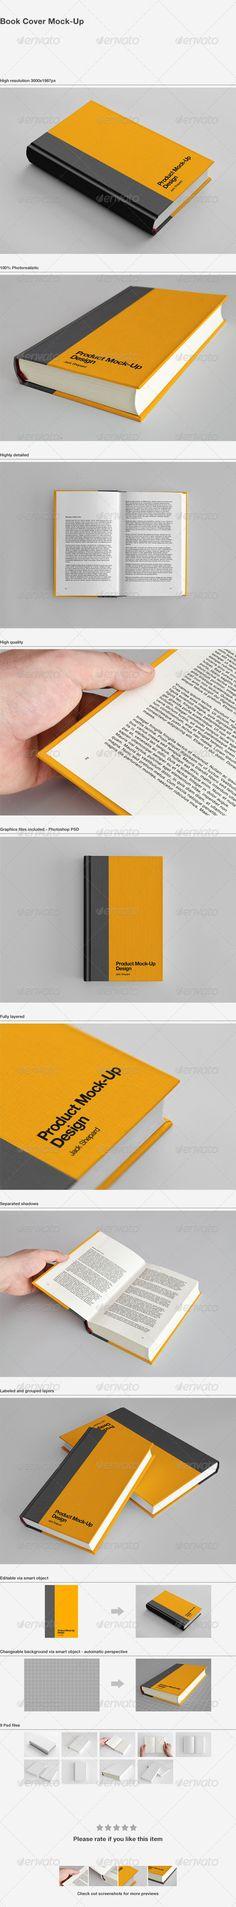 Book Cover Mock-Up Download here: https://graphicriver.net/item/book-cover-mockup/1687037?ref=KlitVogli